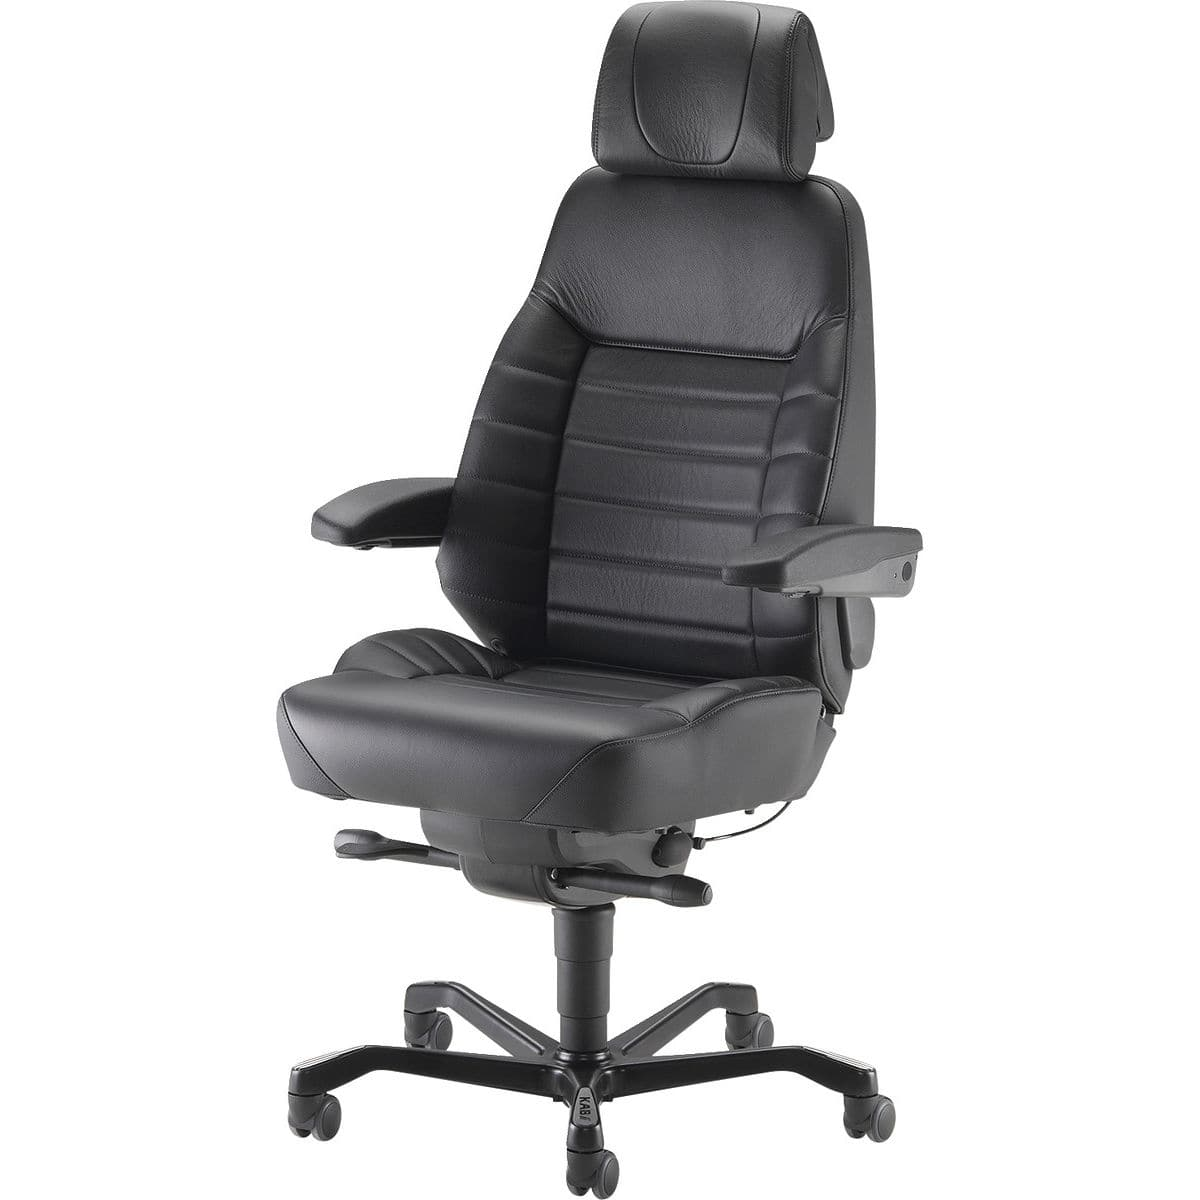 Contemporary executive chair - KAB E36CI - ISKU - leather / fabric